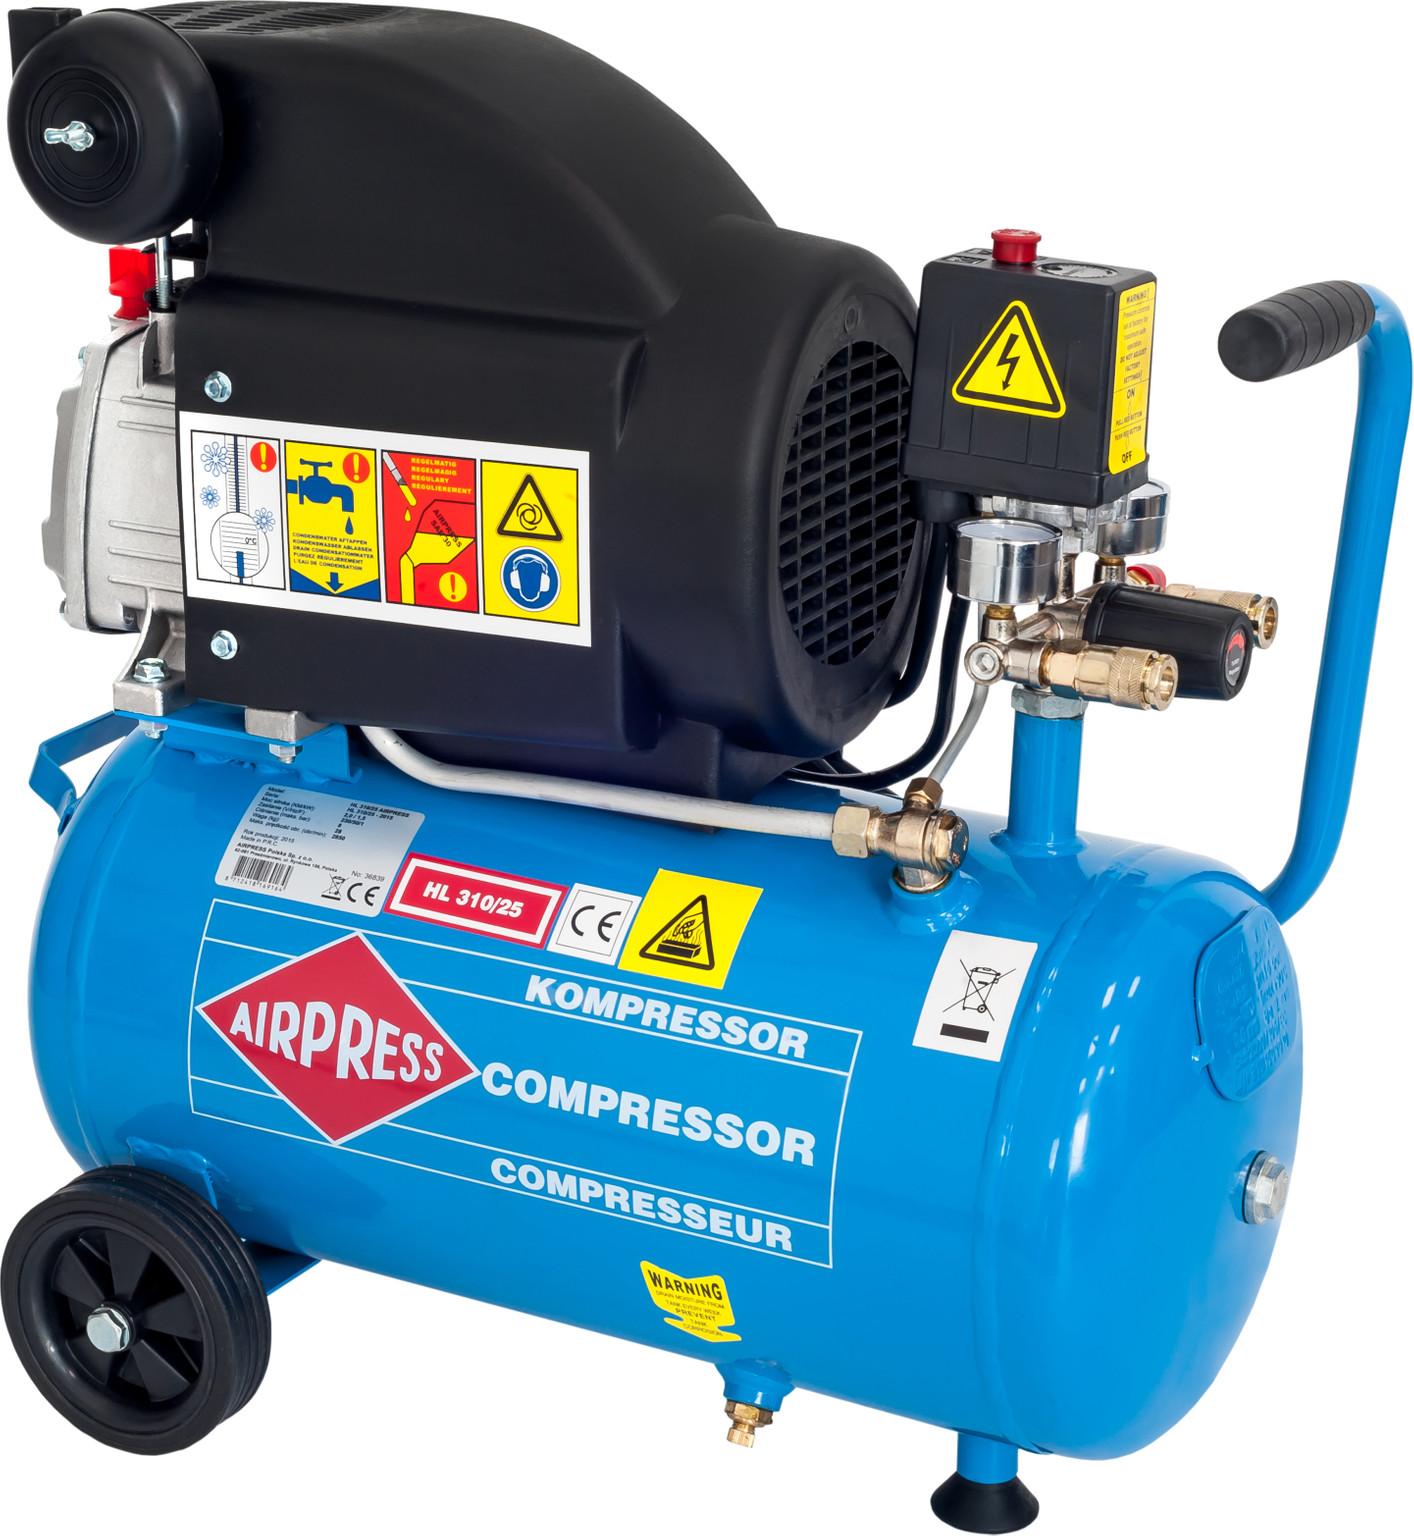 Compressor HL 310/25